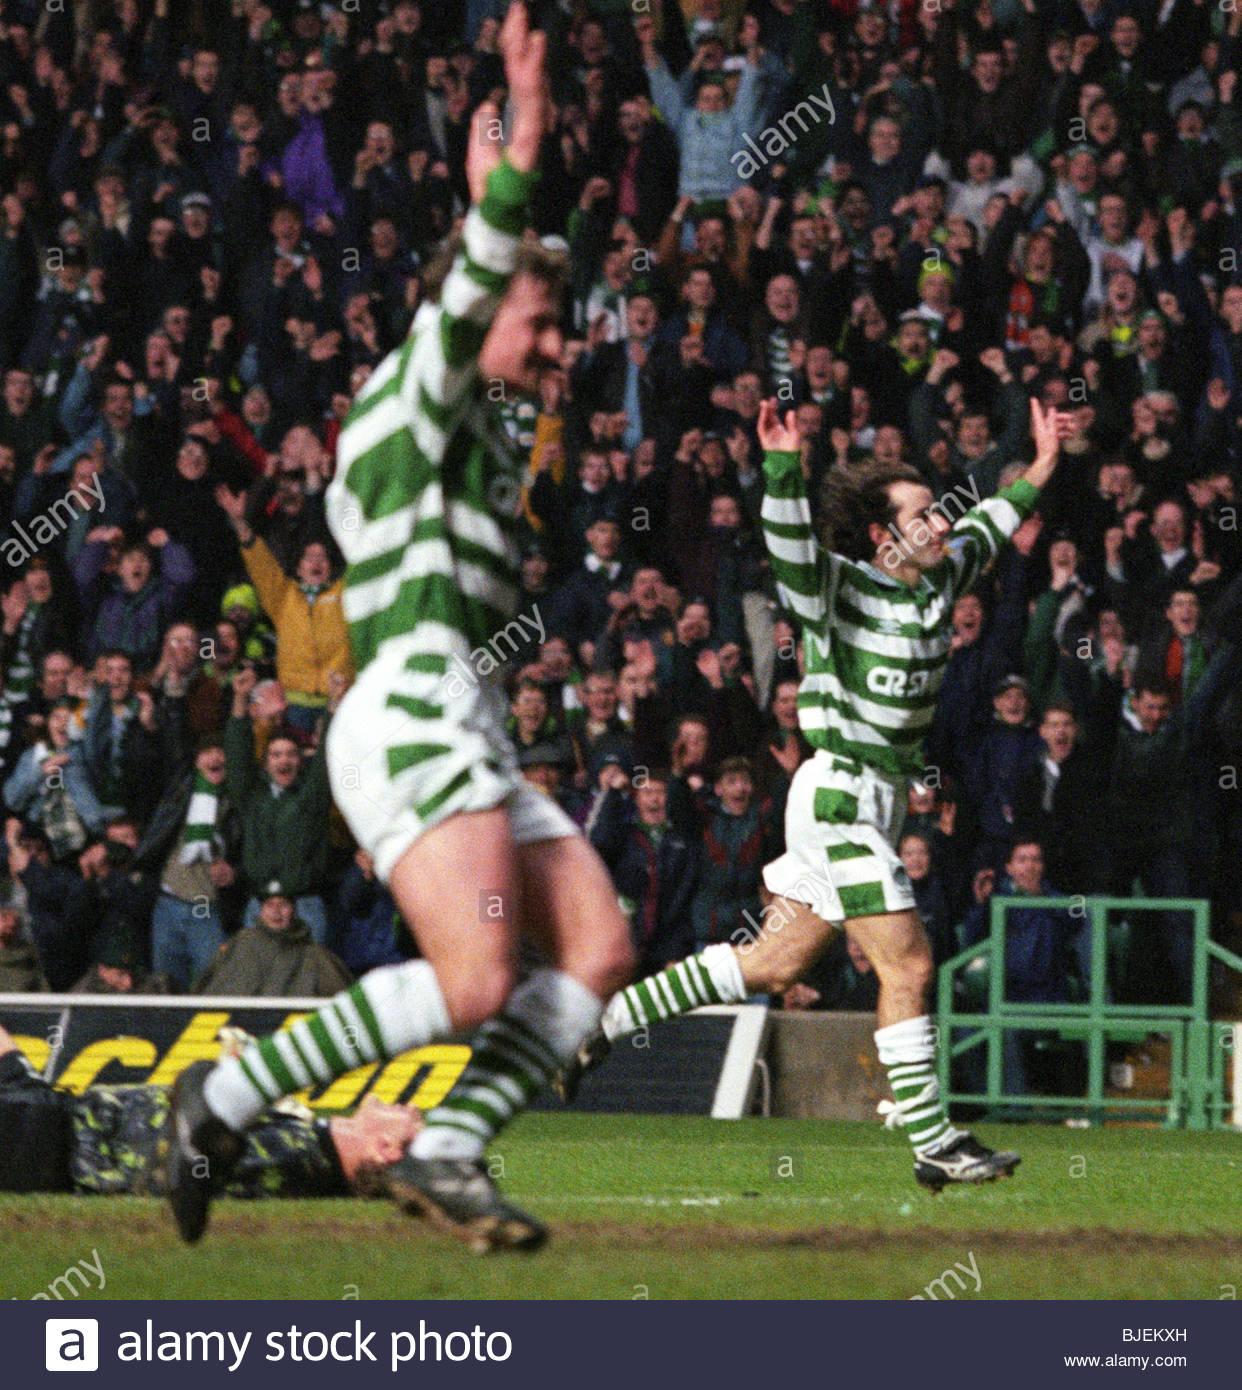 18/01/97 BELL'S PREMIER DIVISION CELTIC V HIBS (4-1) CELTIC PARK - GLASGOW Celtic's Brian McLaughlan (right) - Stock Image